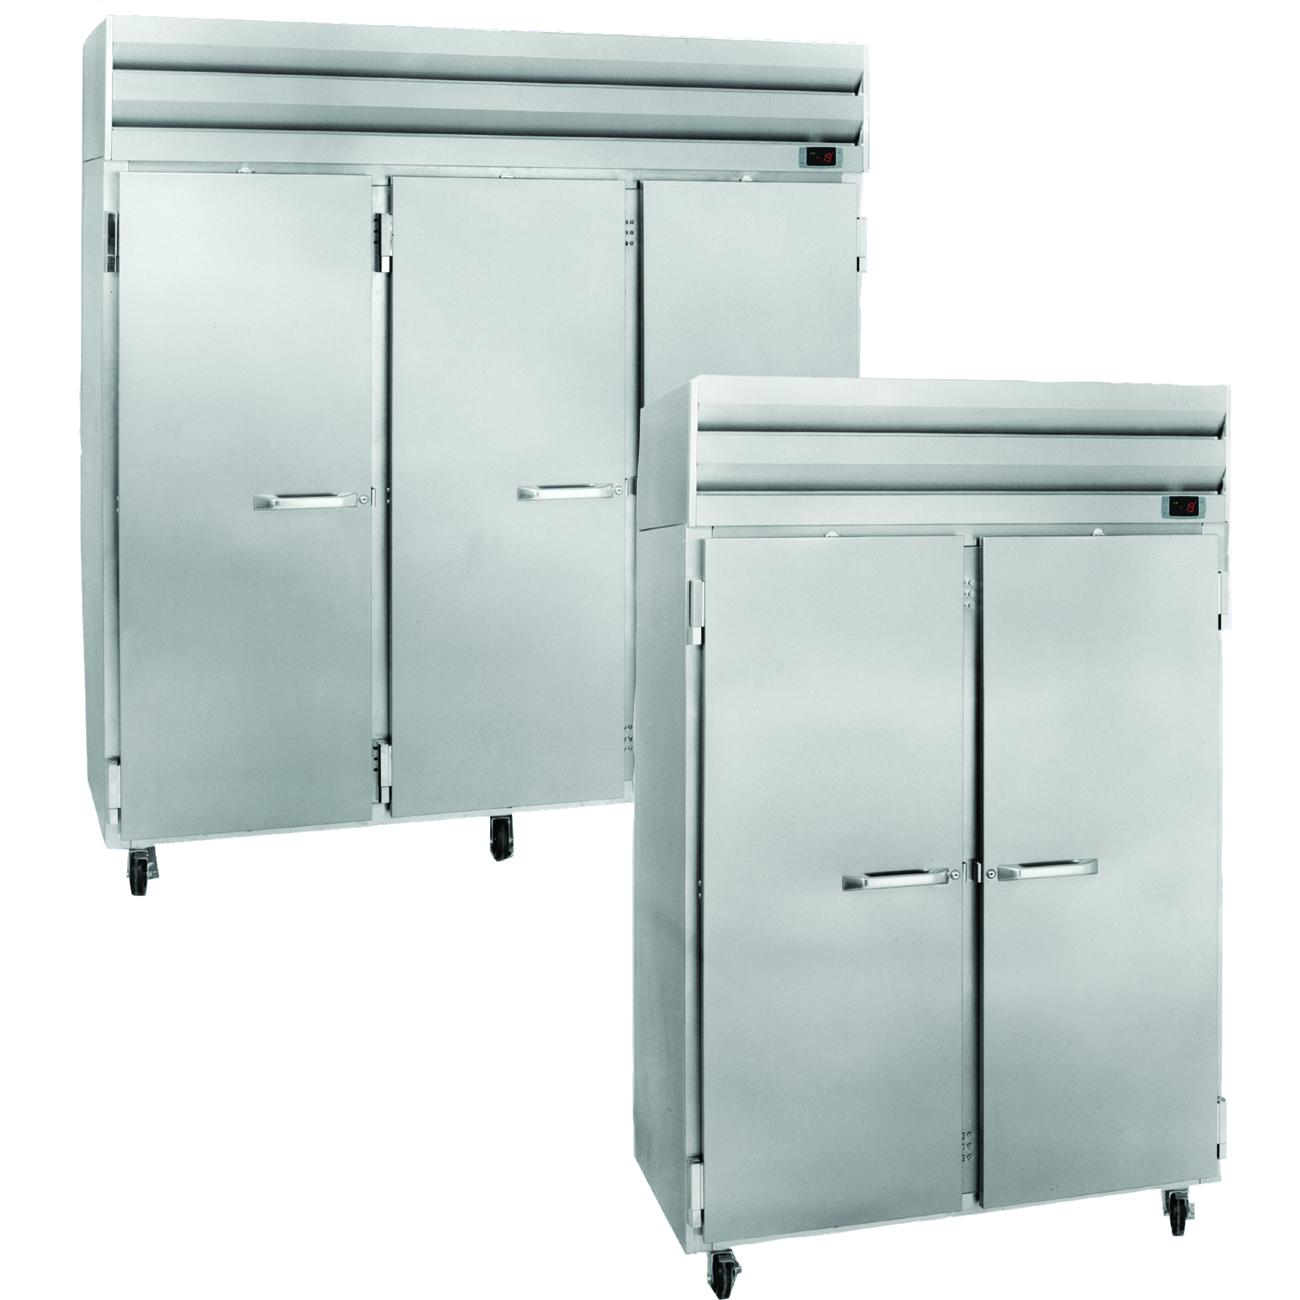 Howard-McCray R-SR48 refrigerator, reach-in